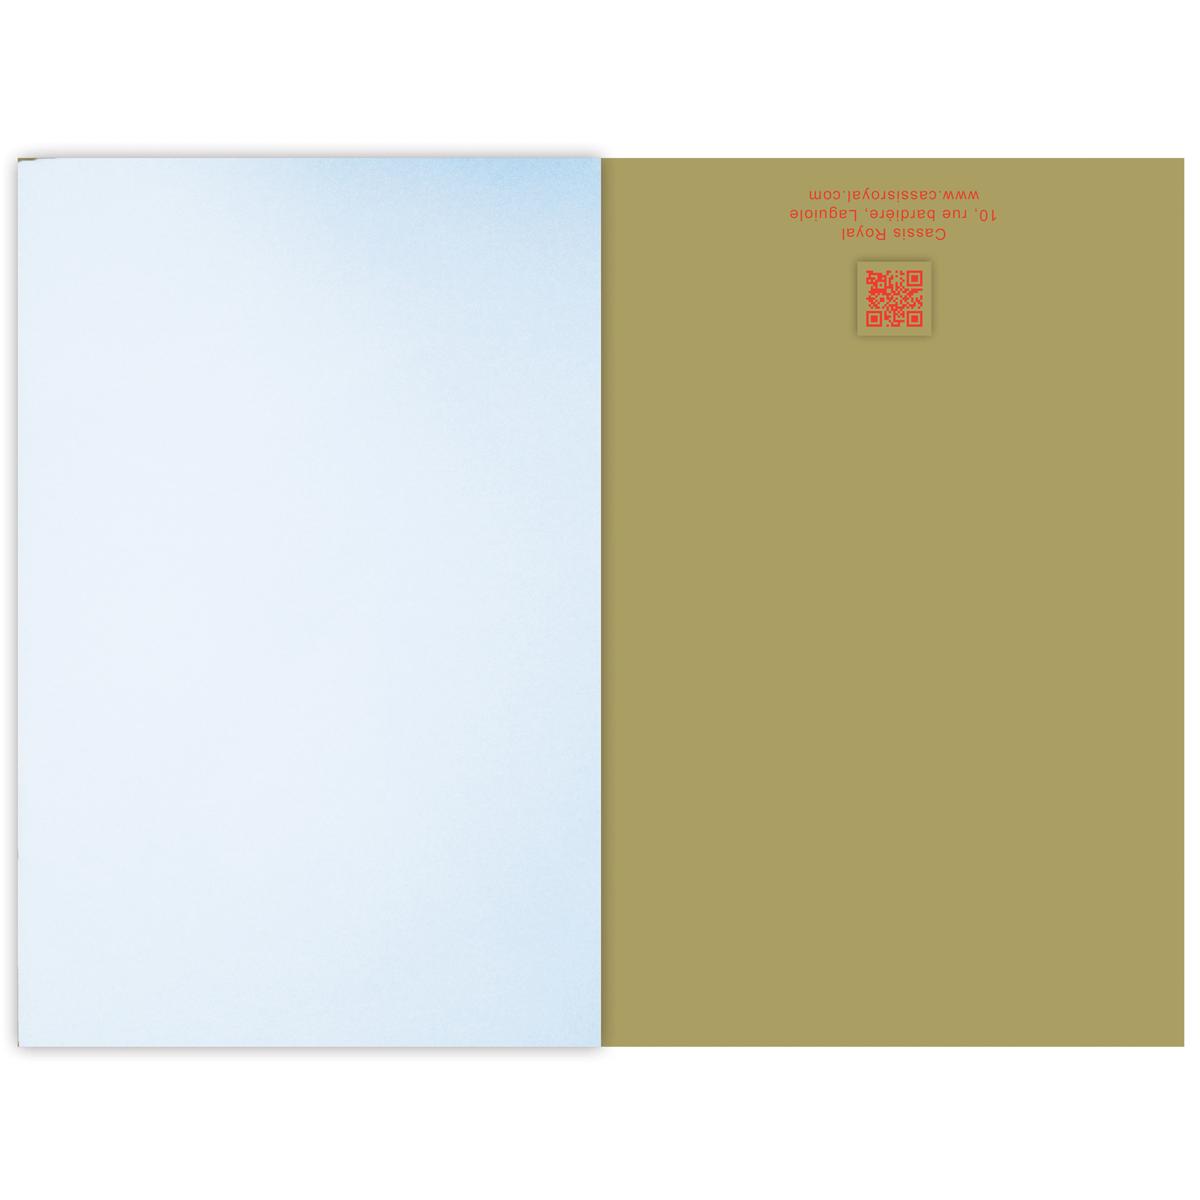 Cassis Royal Carnet Nain Jaune 64 Pages Cassis Royal